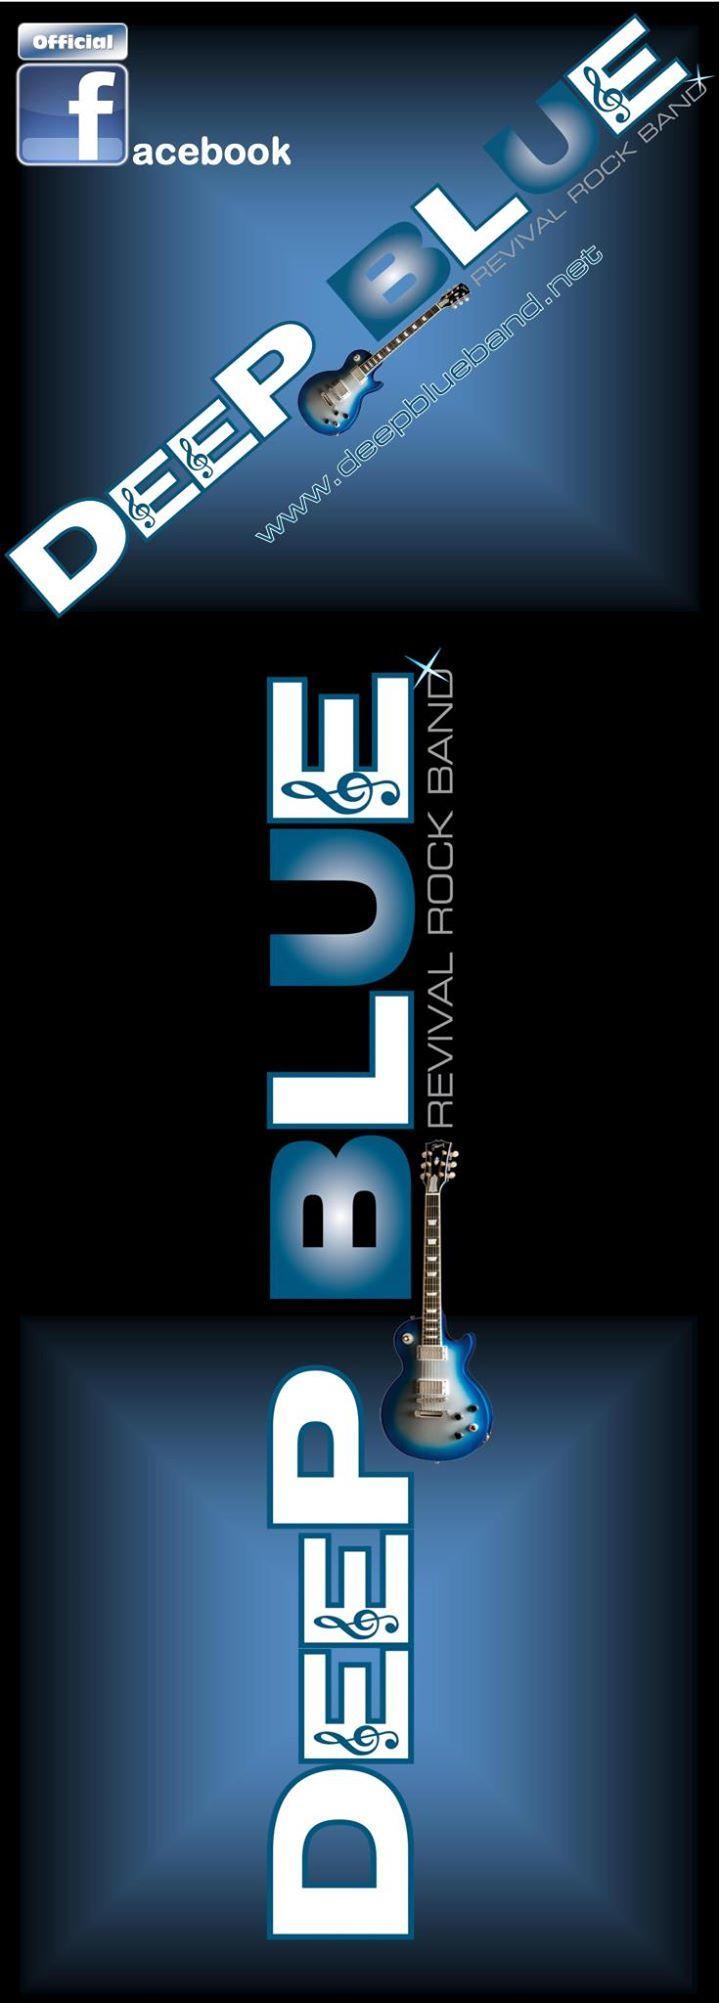 DeeP bLuE Band Tour Dates